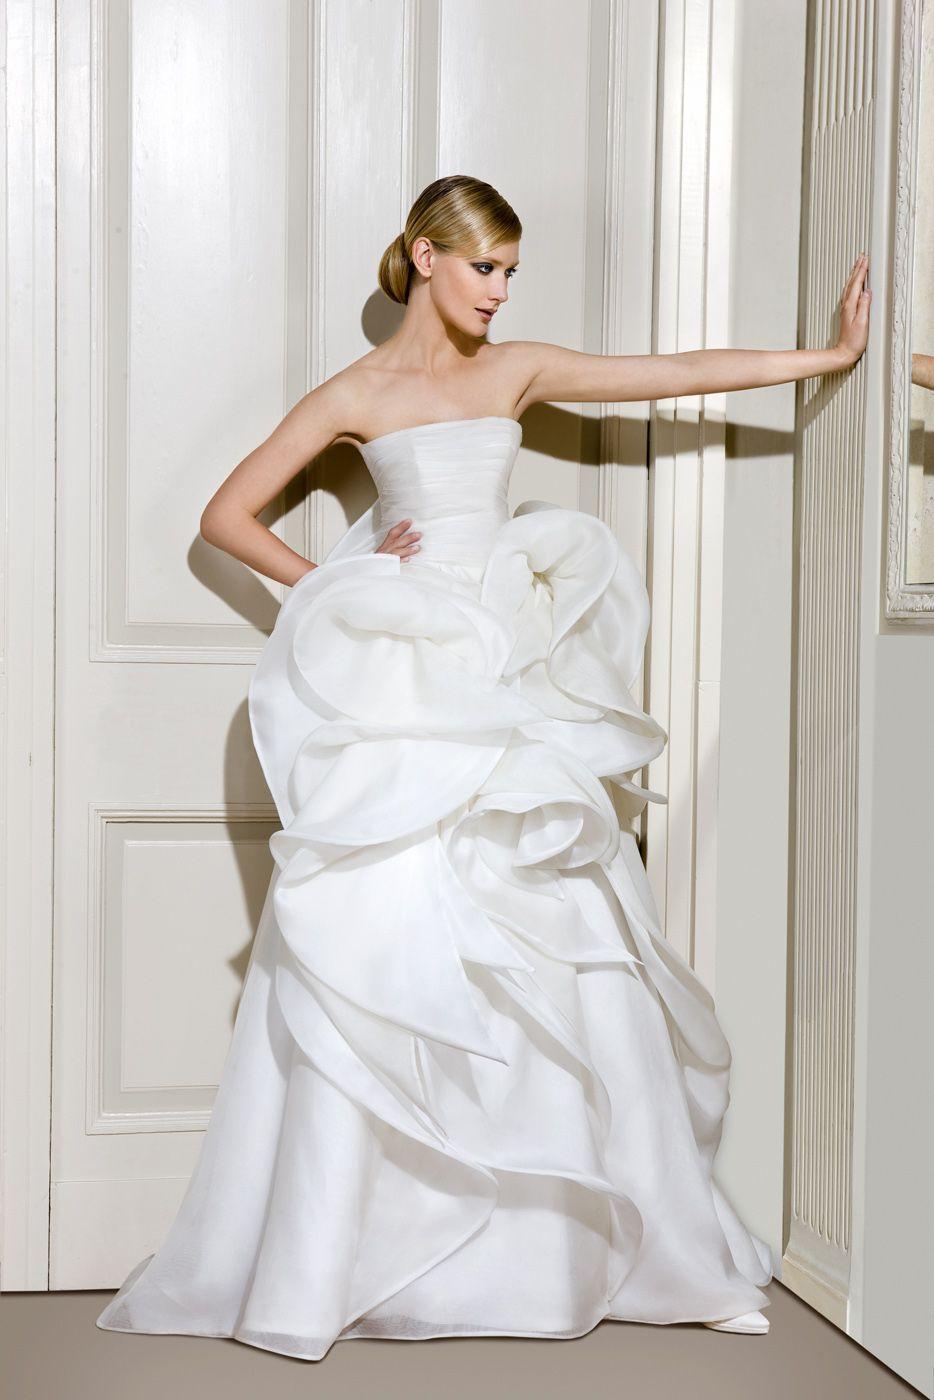 #AntonioRiva #weddingdress #Whitedress #Wedding #Nozze #matrimonio #abitodasposa #MadeInItaly #sposa